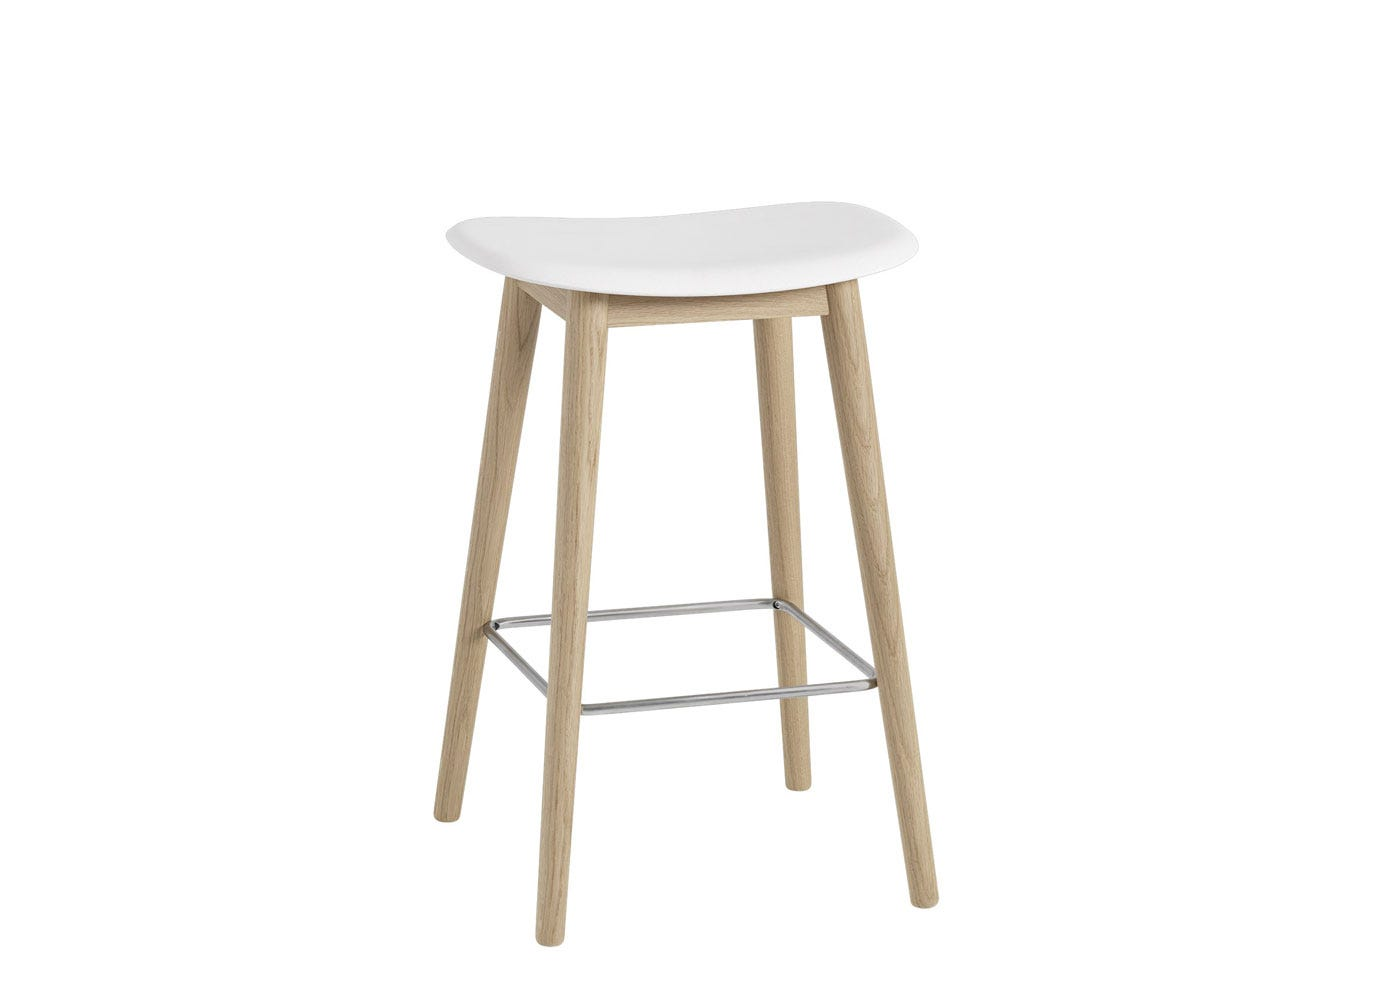 Fiber Counter Stool Without Backrest Wooden Base White & Oak